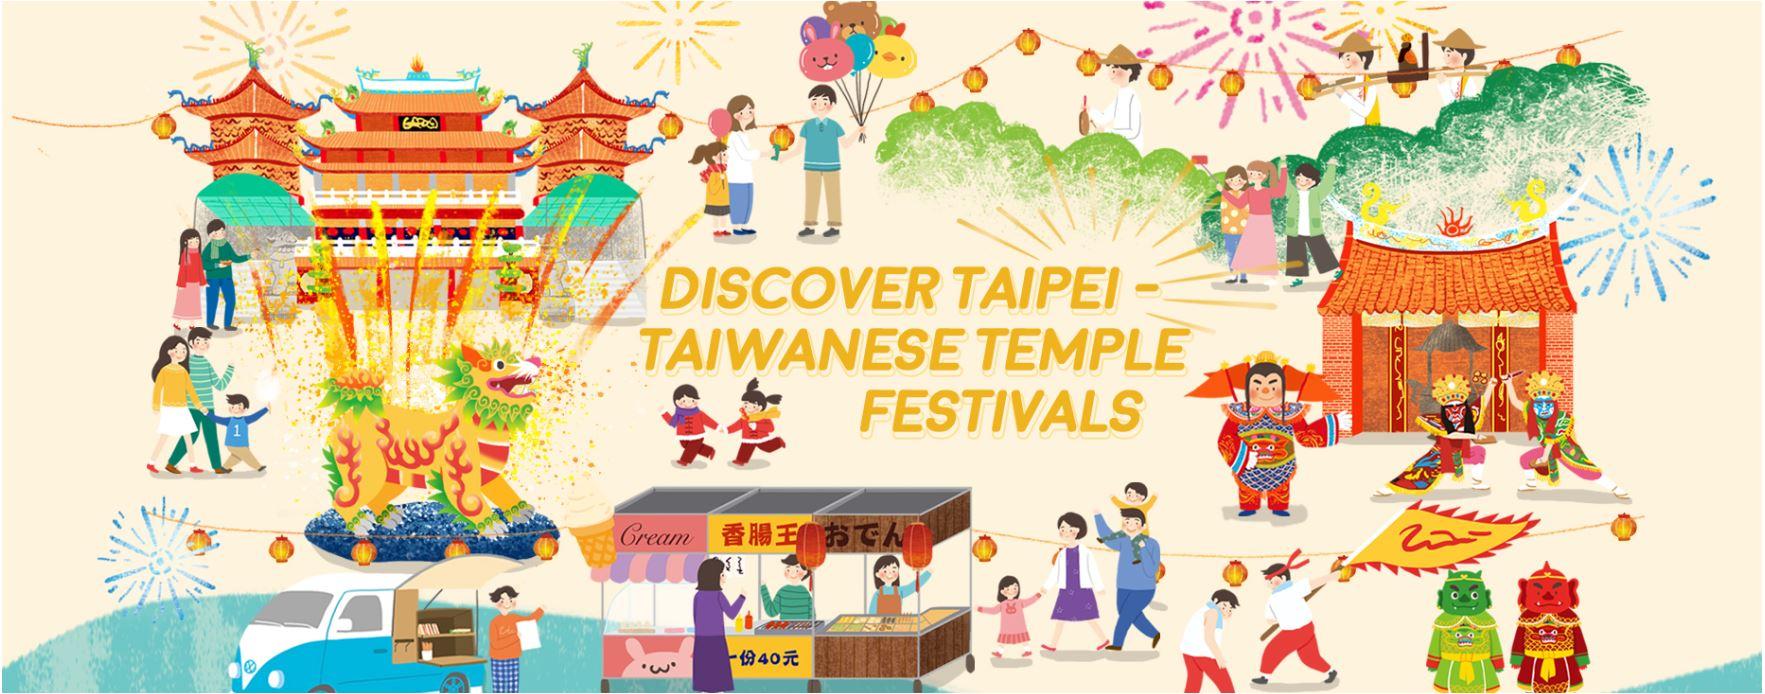 Discover Taipei-Taiwanese Temple Festival